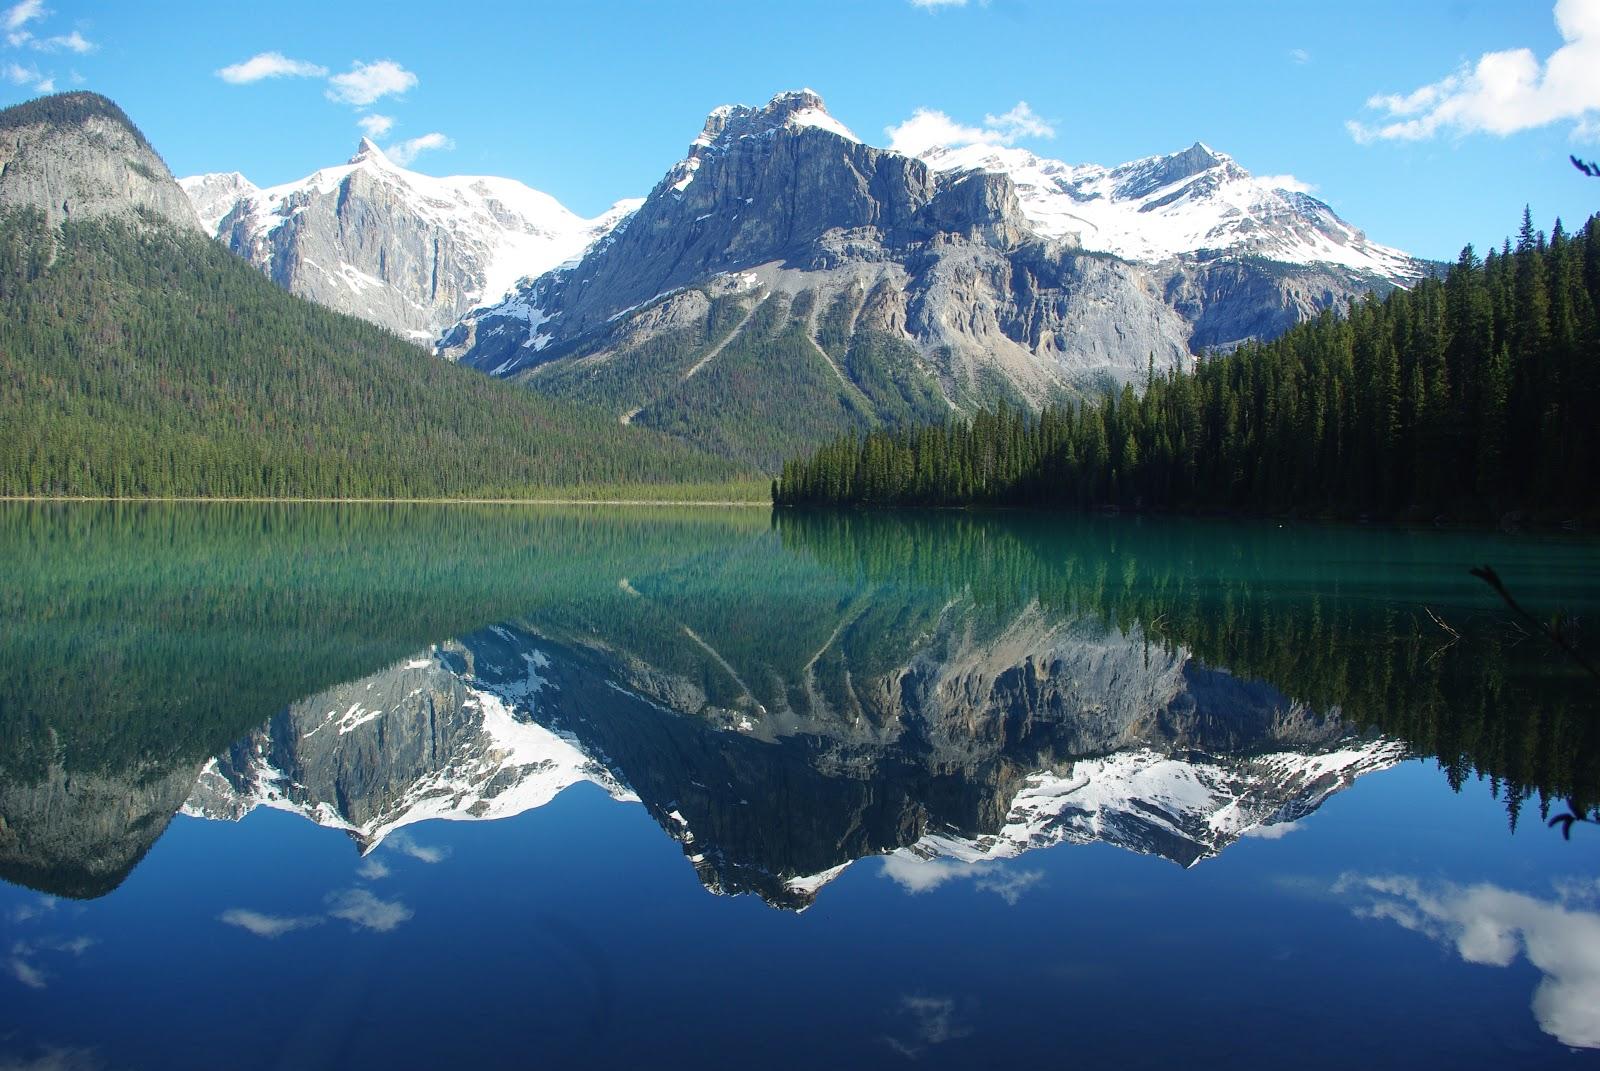 Travel trip journey emerald lake yoho national park british